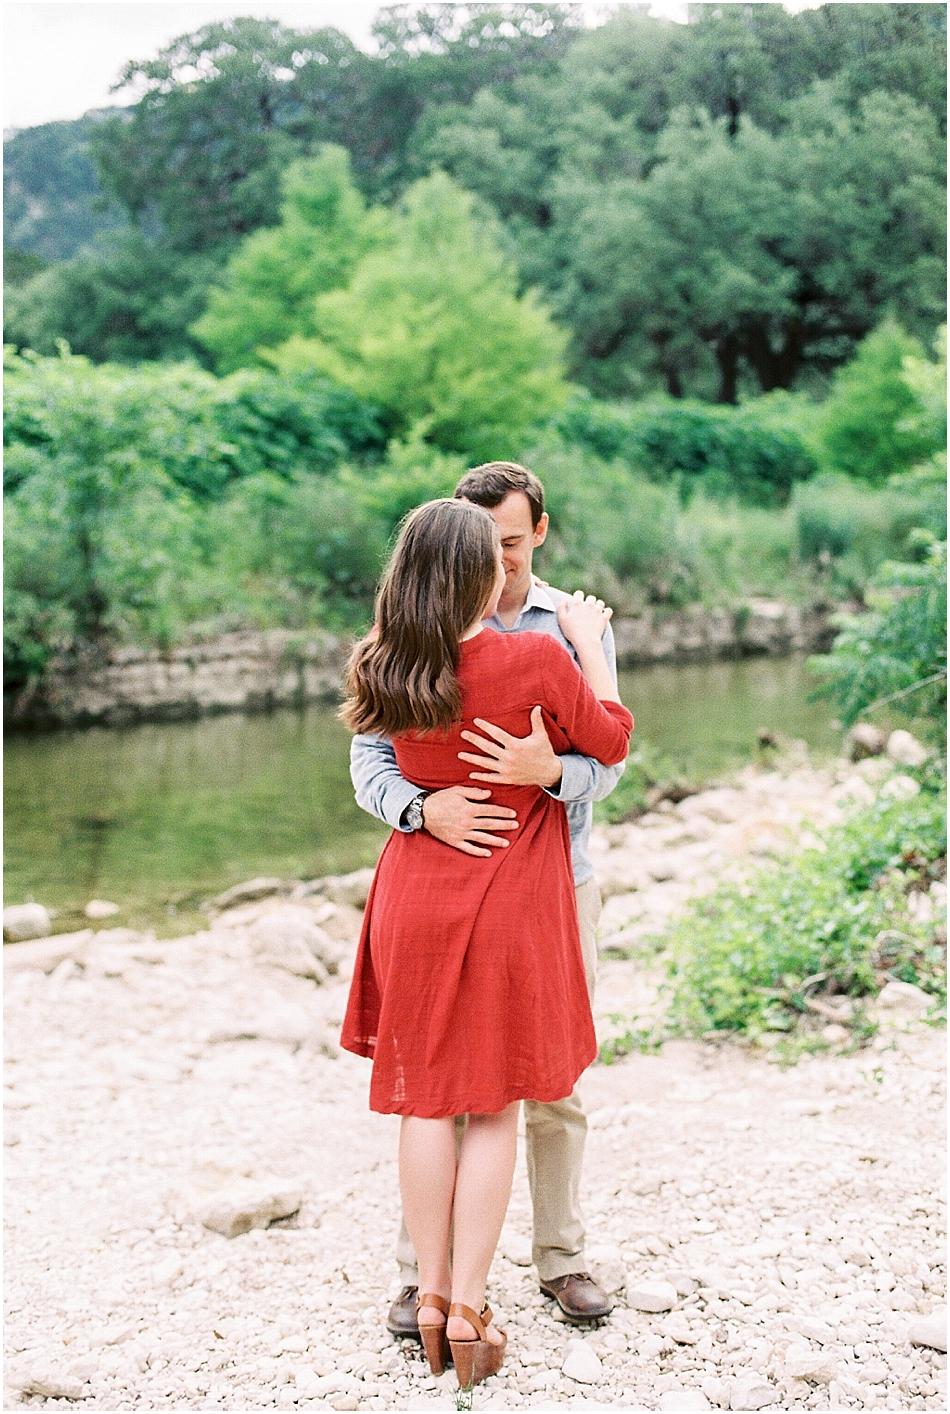 Laura + Nick | Engagement | Fine Art Film | Austin Texas | Emilie Anne Photography-37.jpg